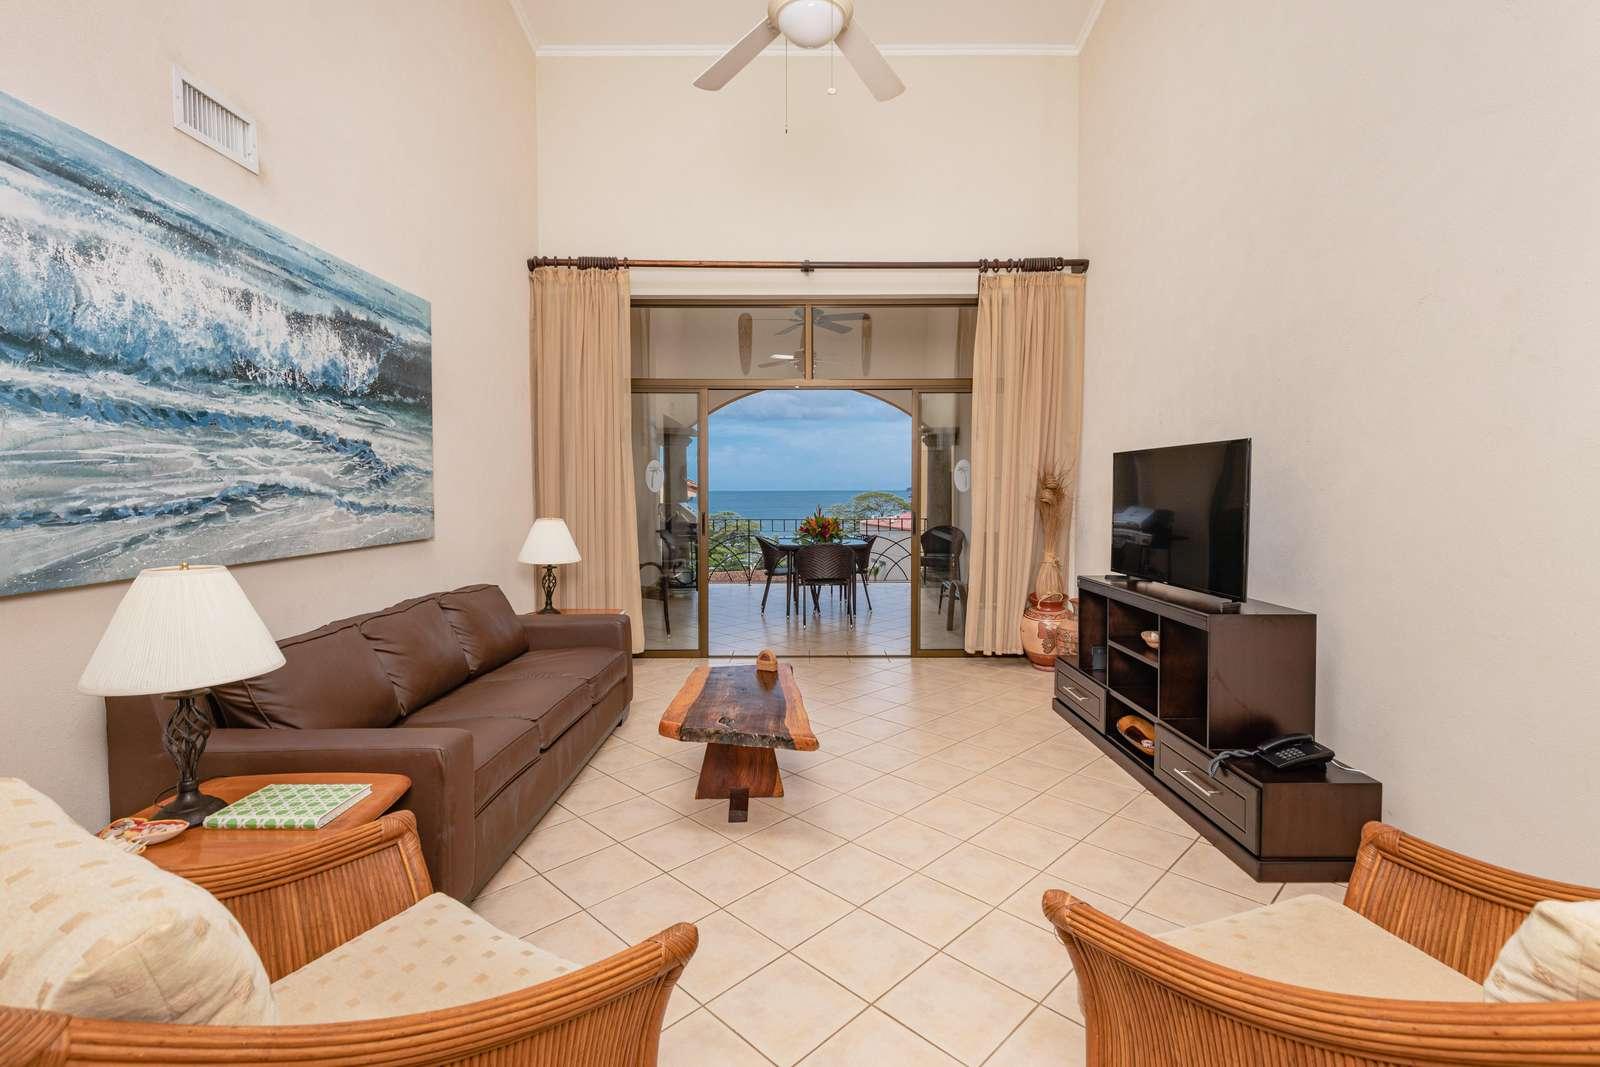 Spacious living area, sleeper sofa, Flat screen TV, vaulted ceilings